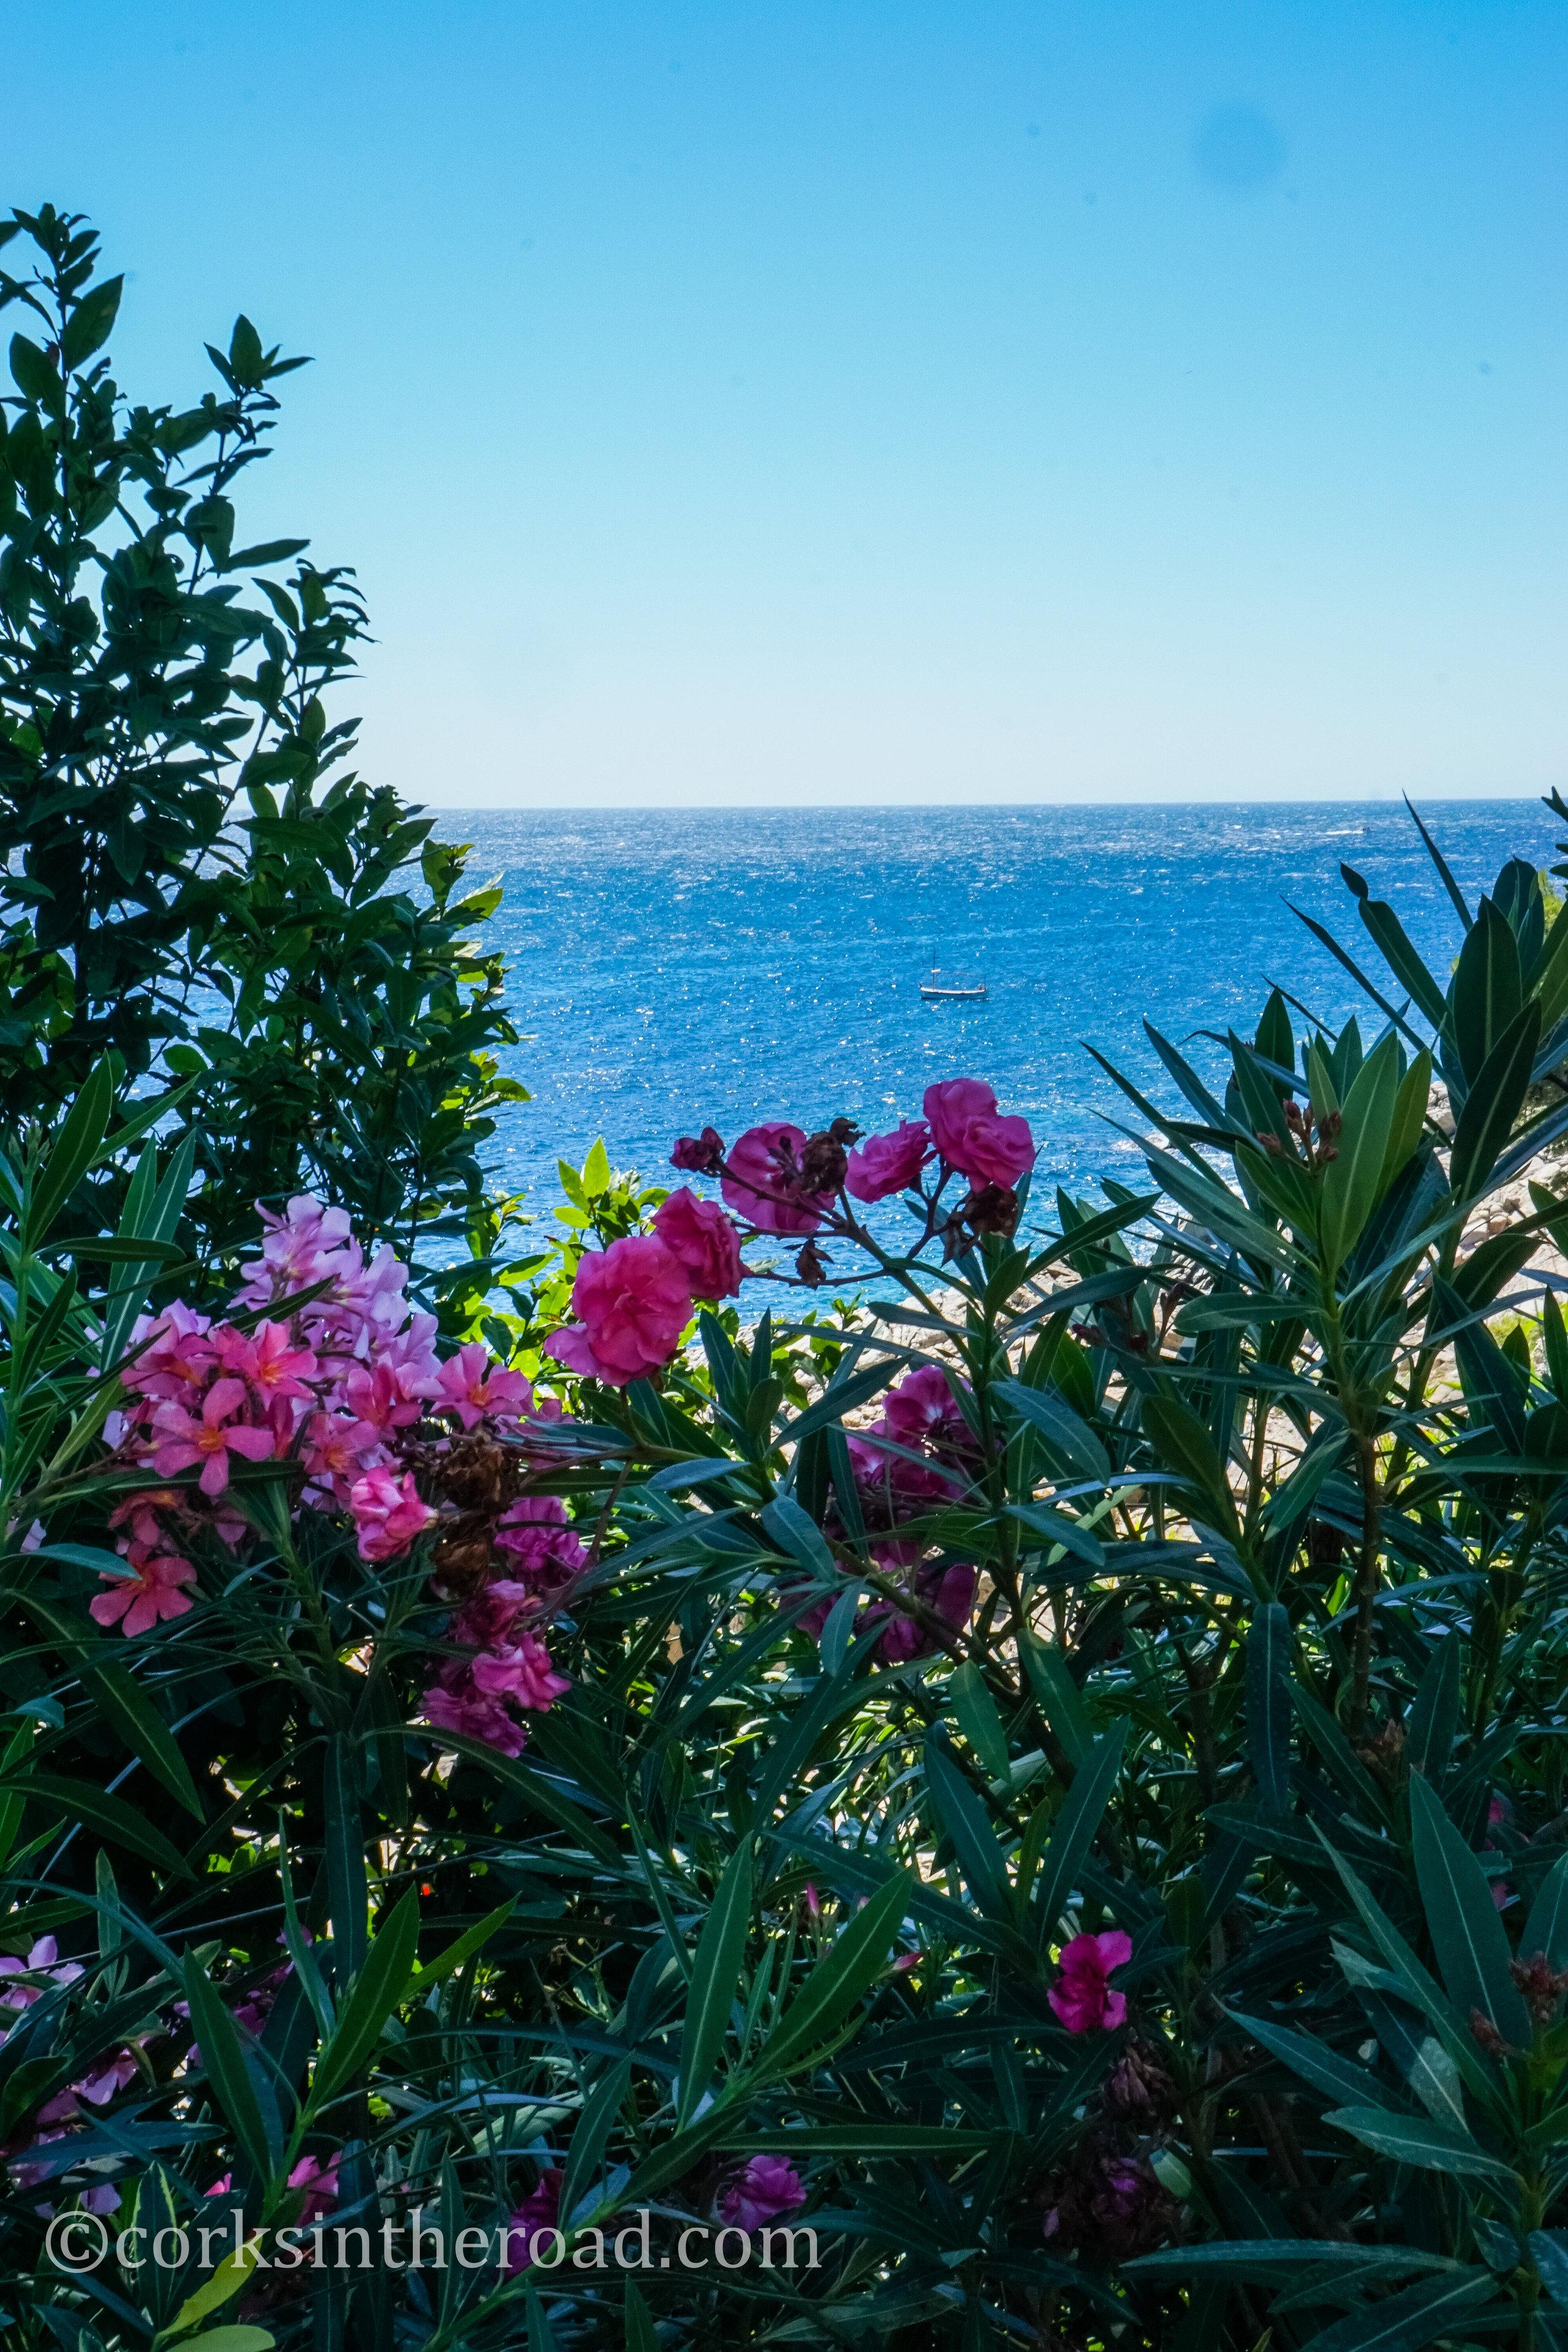 20160807Barcelona, Corksintheroad, Costa Brava, Costa Brava Landscape-11.jpg